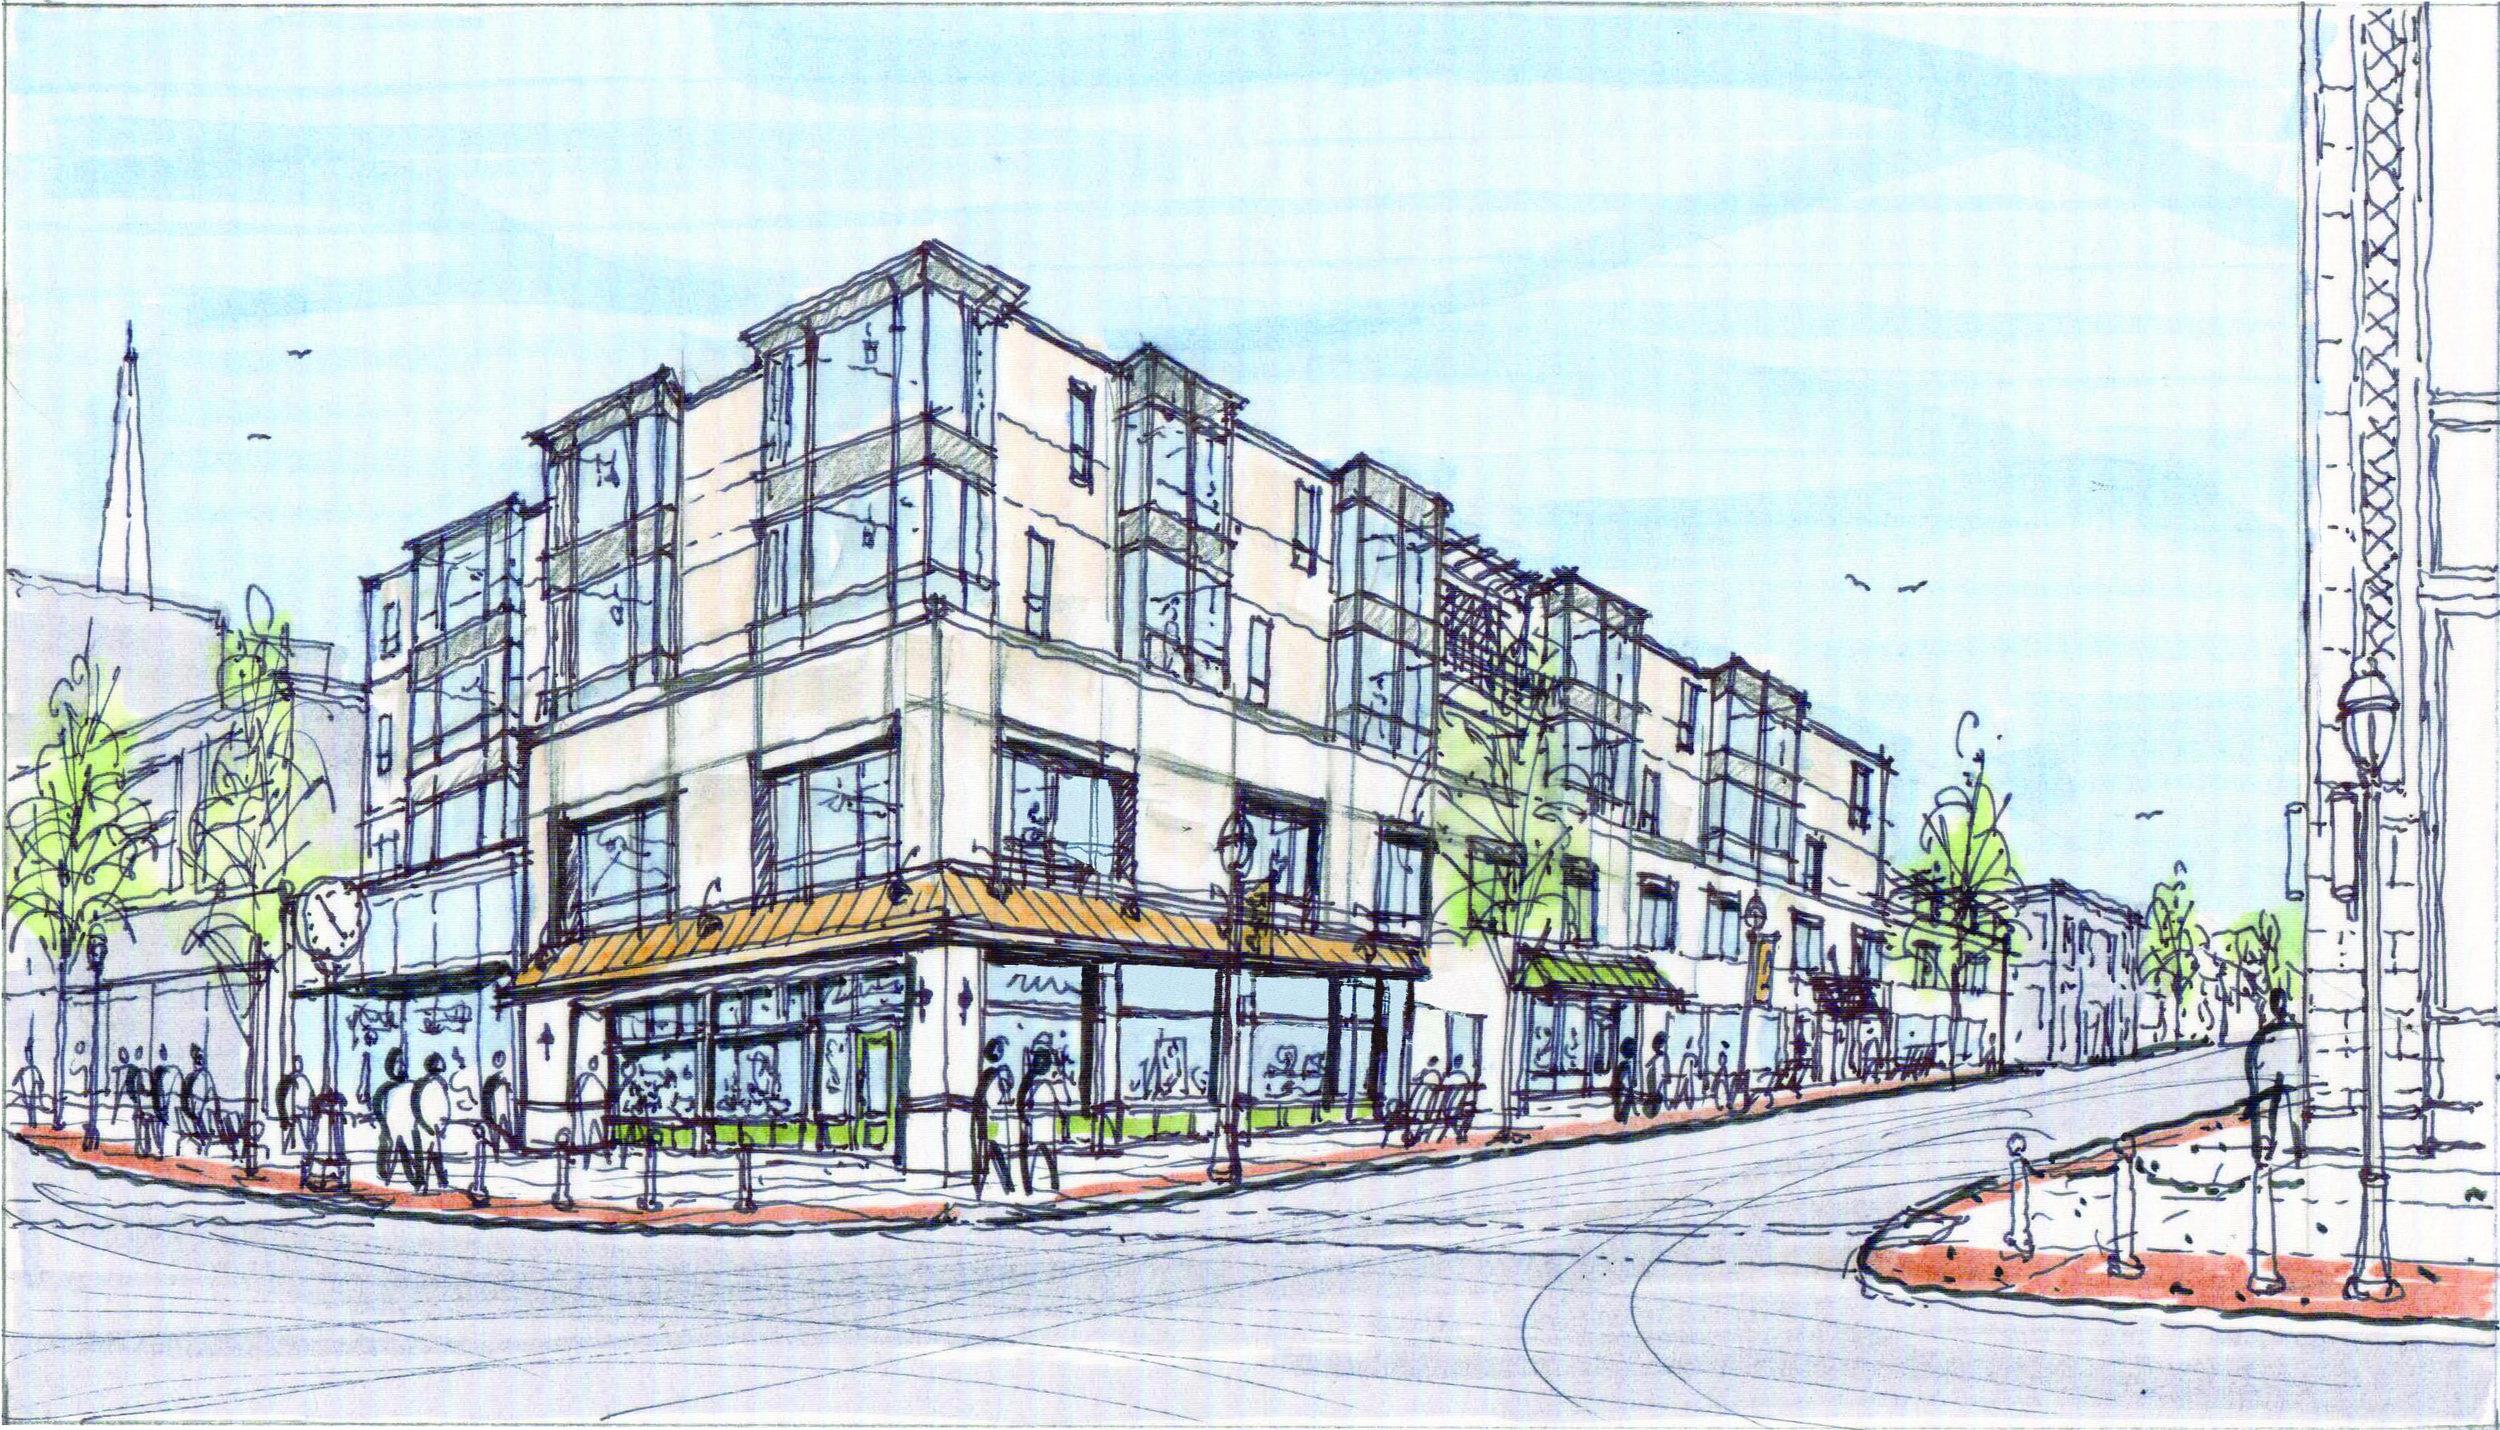 West Market Street Vision Plan